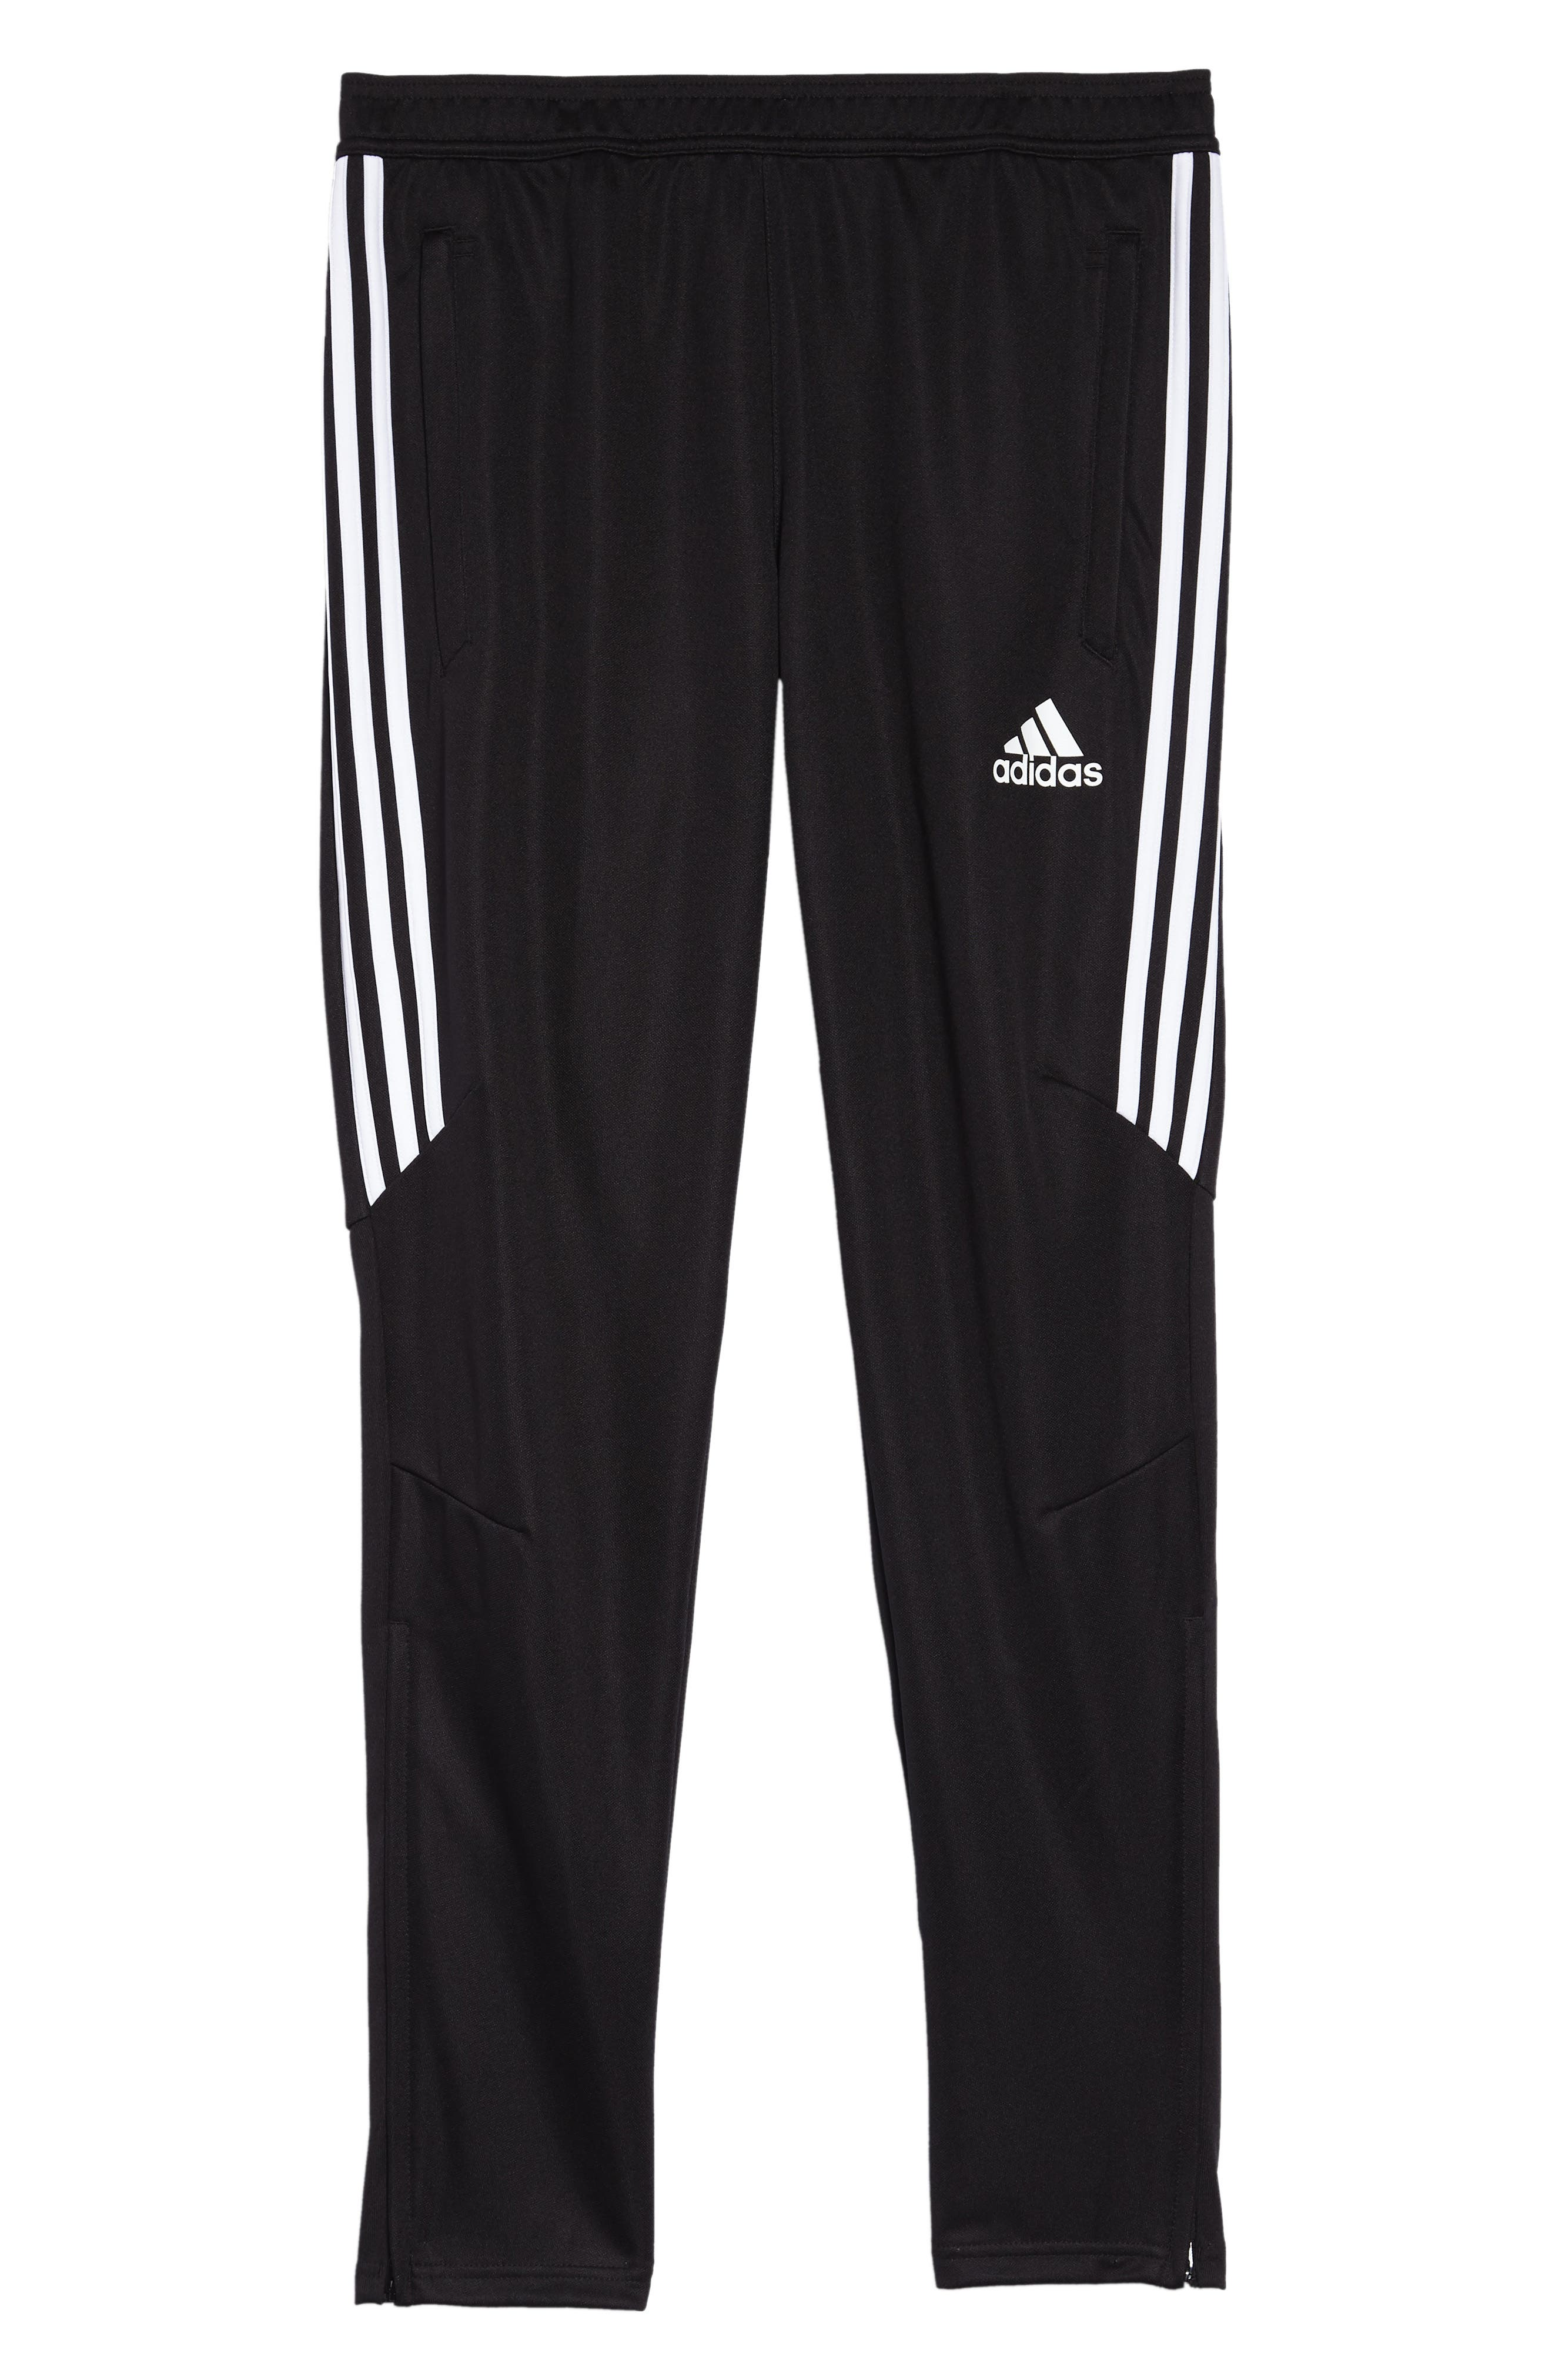 ADIDAS, Tiro 17 Training Pants, Alternate thumbnail 2, color, BLACK/ WHITE/ WHITE